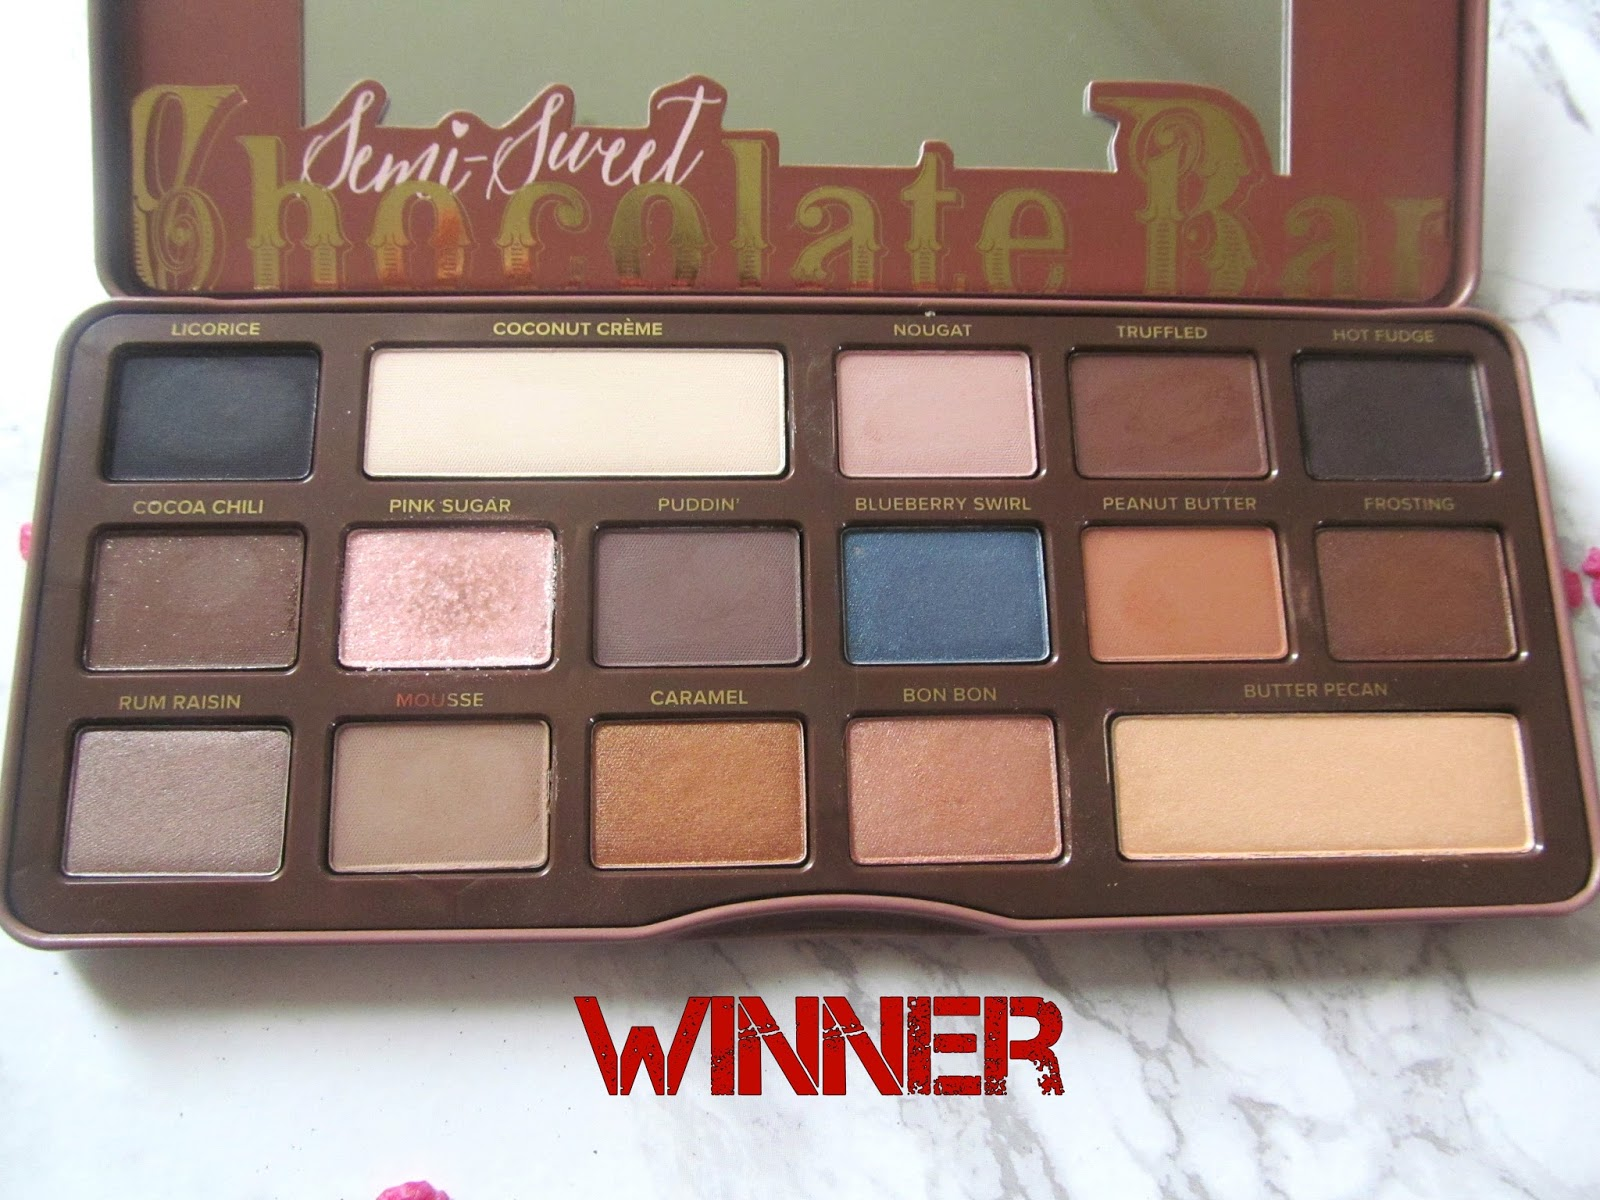 Palette Wars Too Faced S Chocolate Bar Vs Semi Sweet